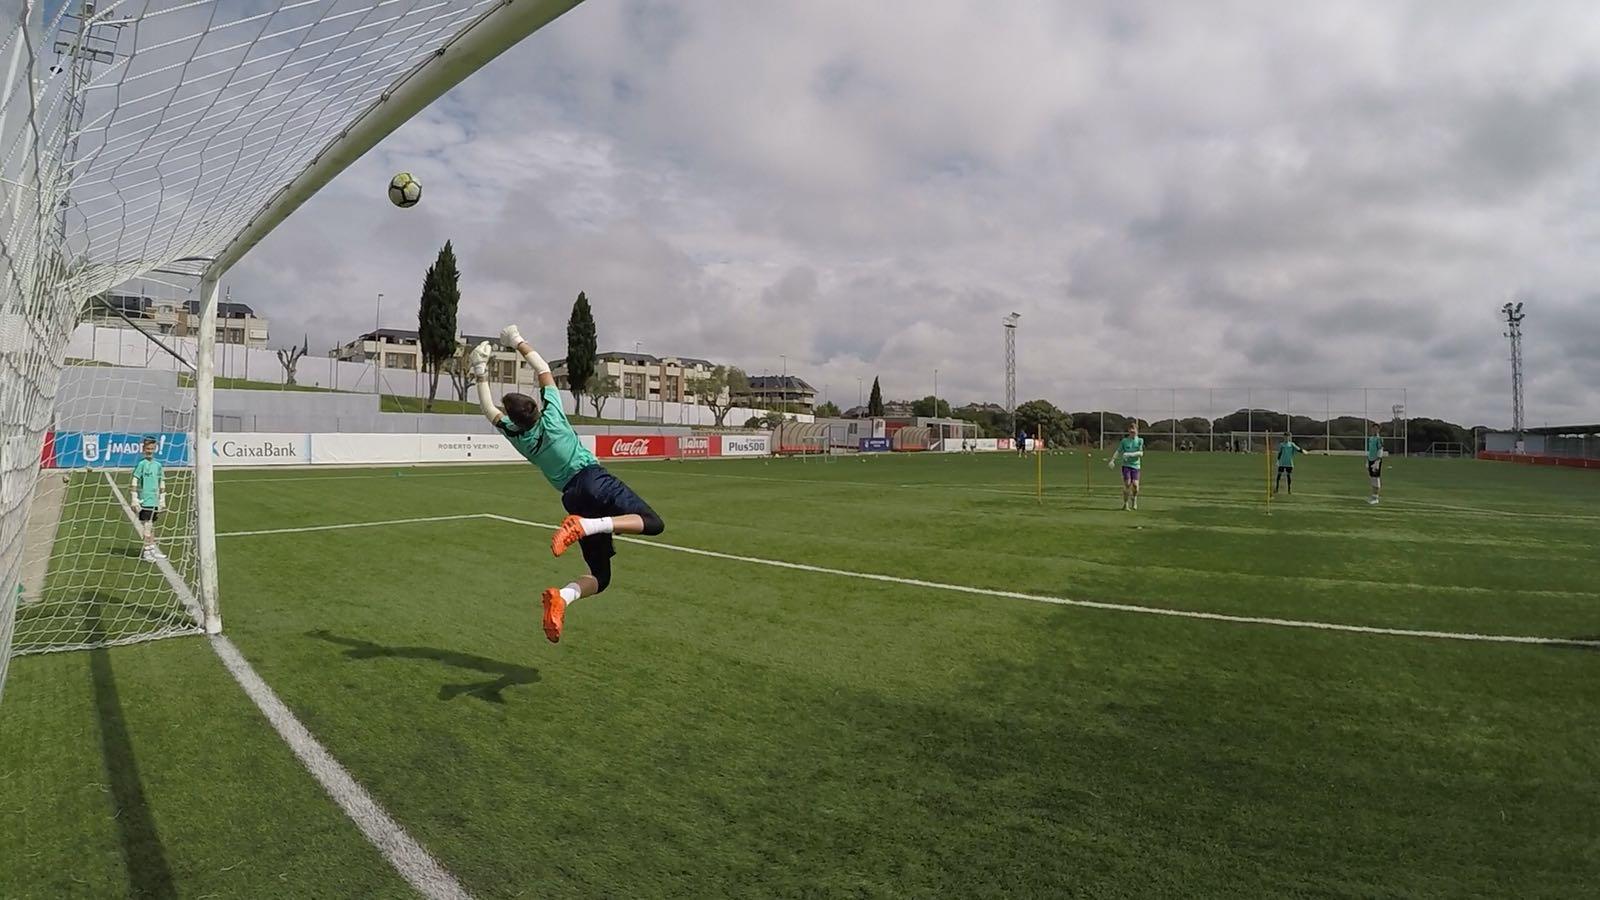 Pro-1 Madrid training camp